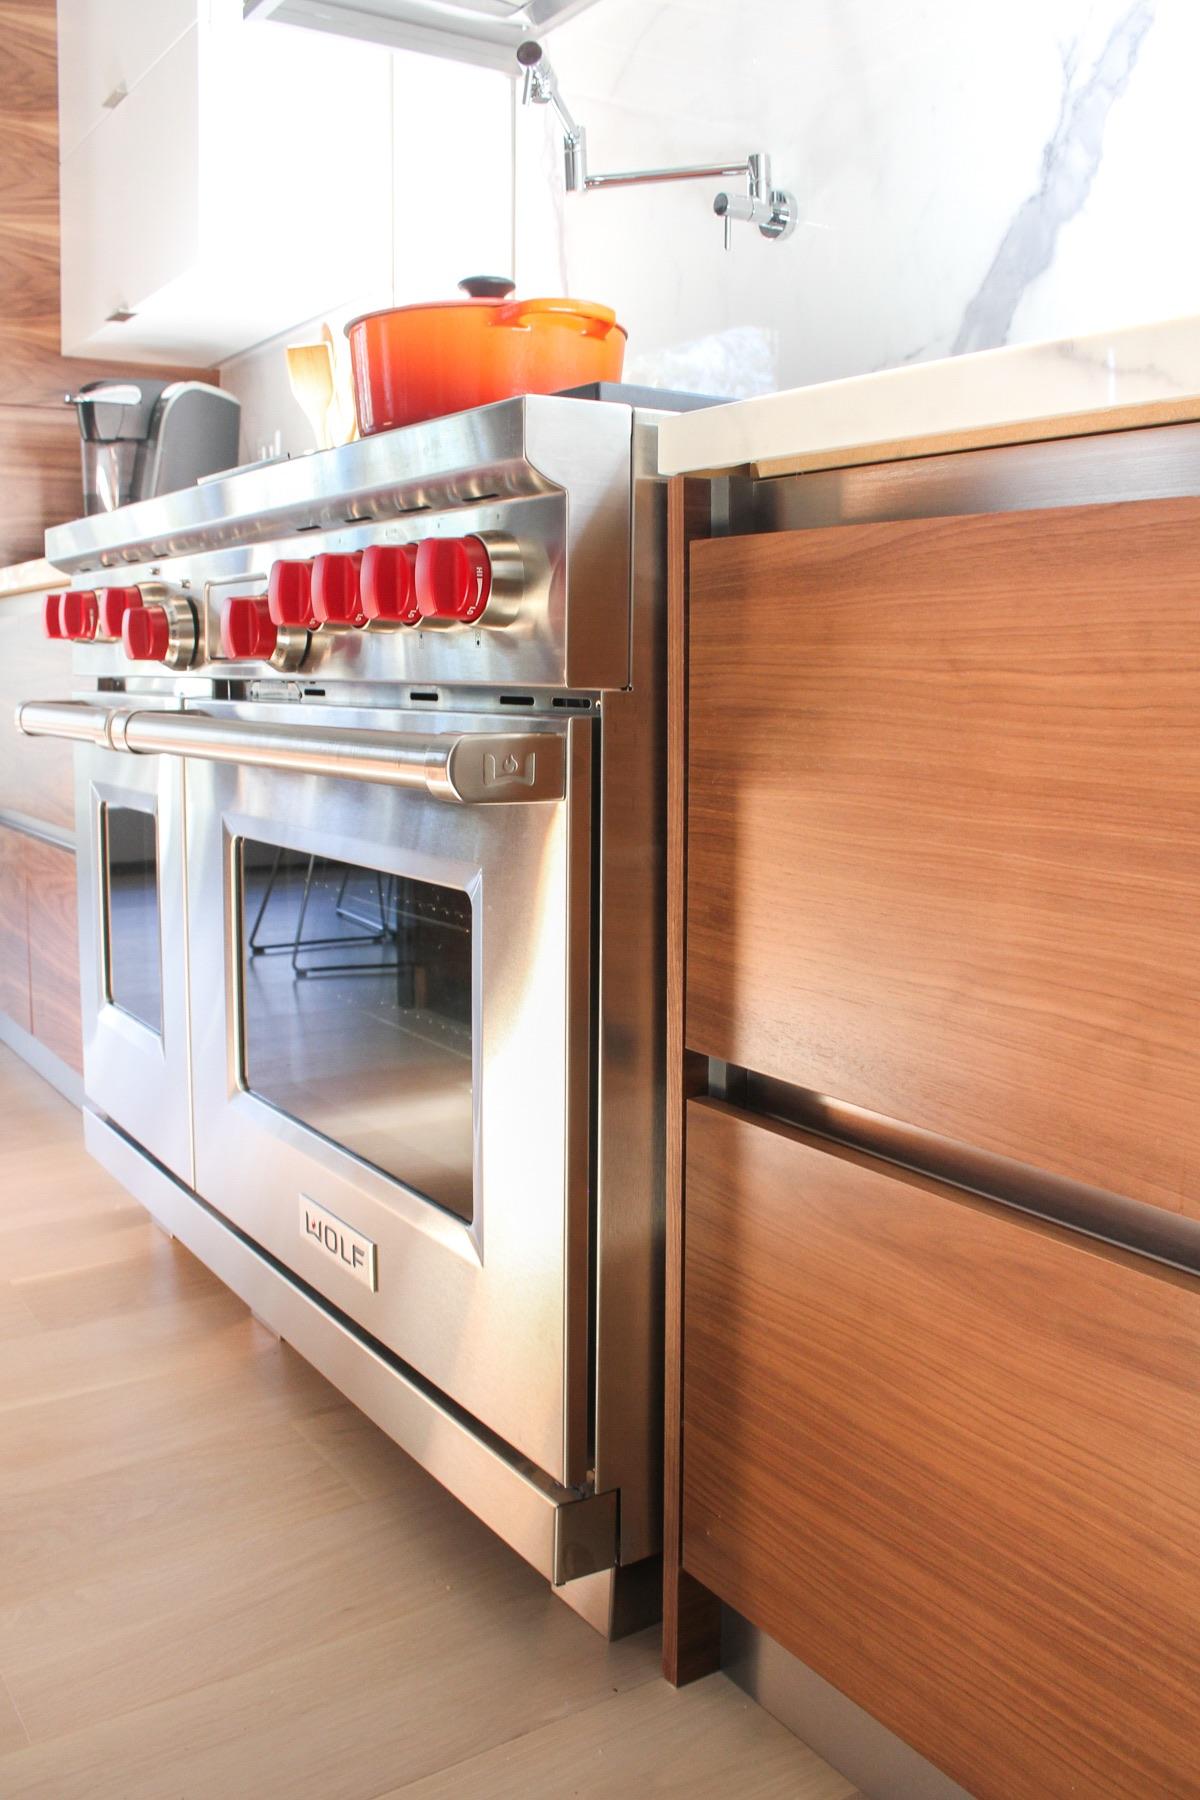 wood drawer and stove